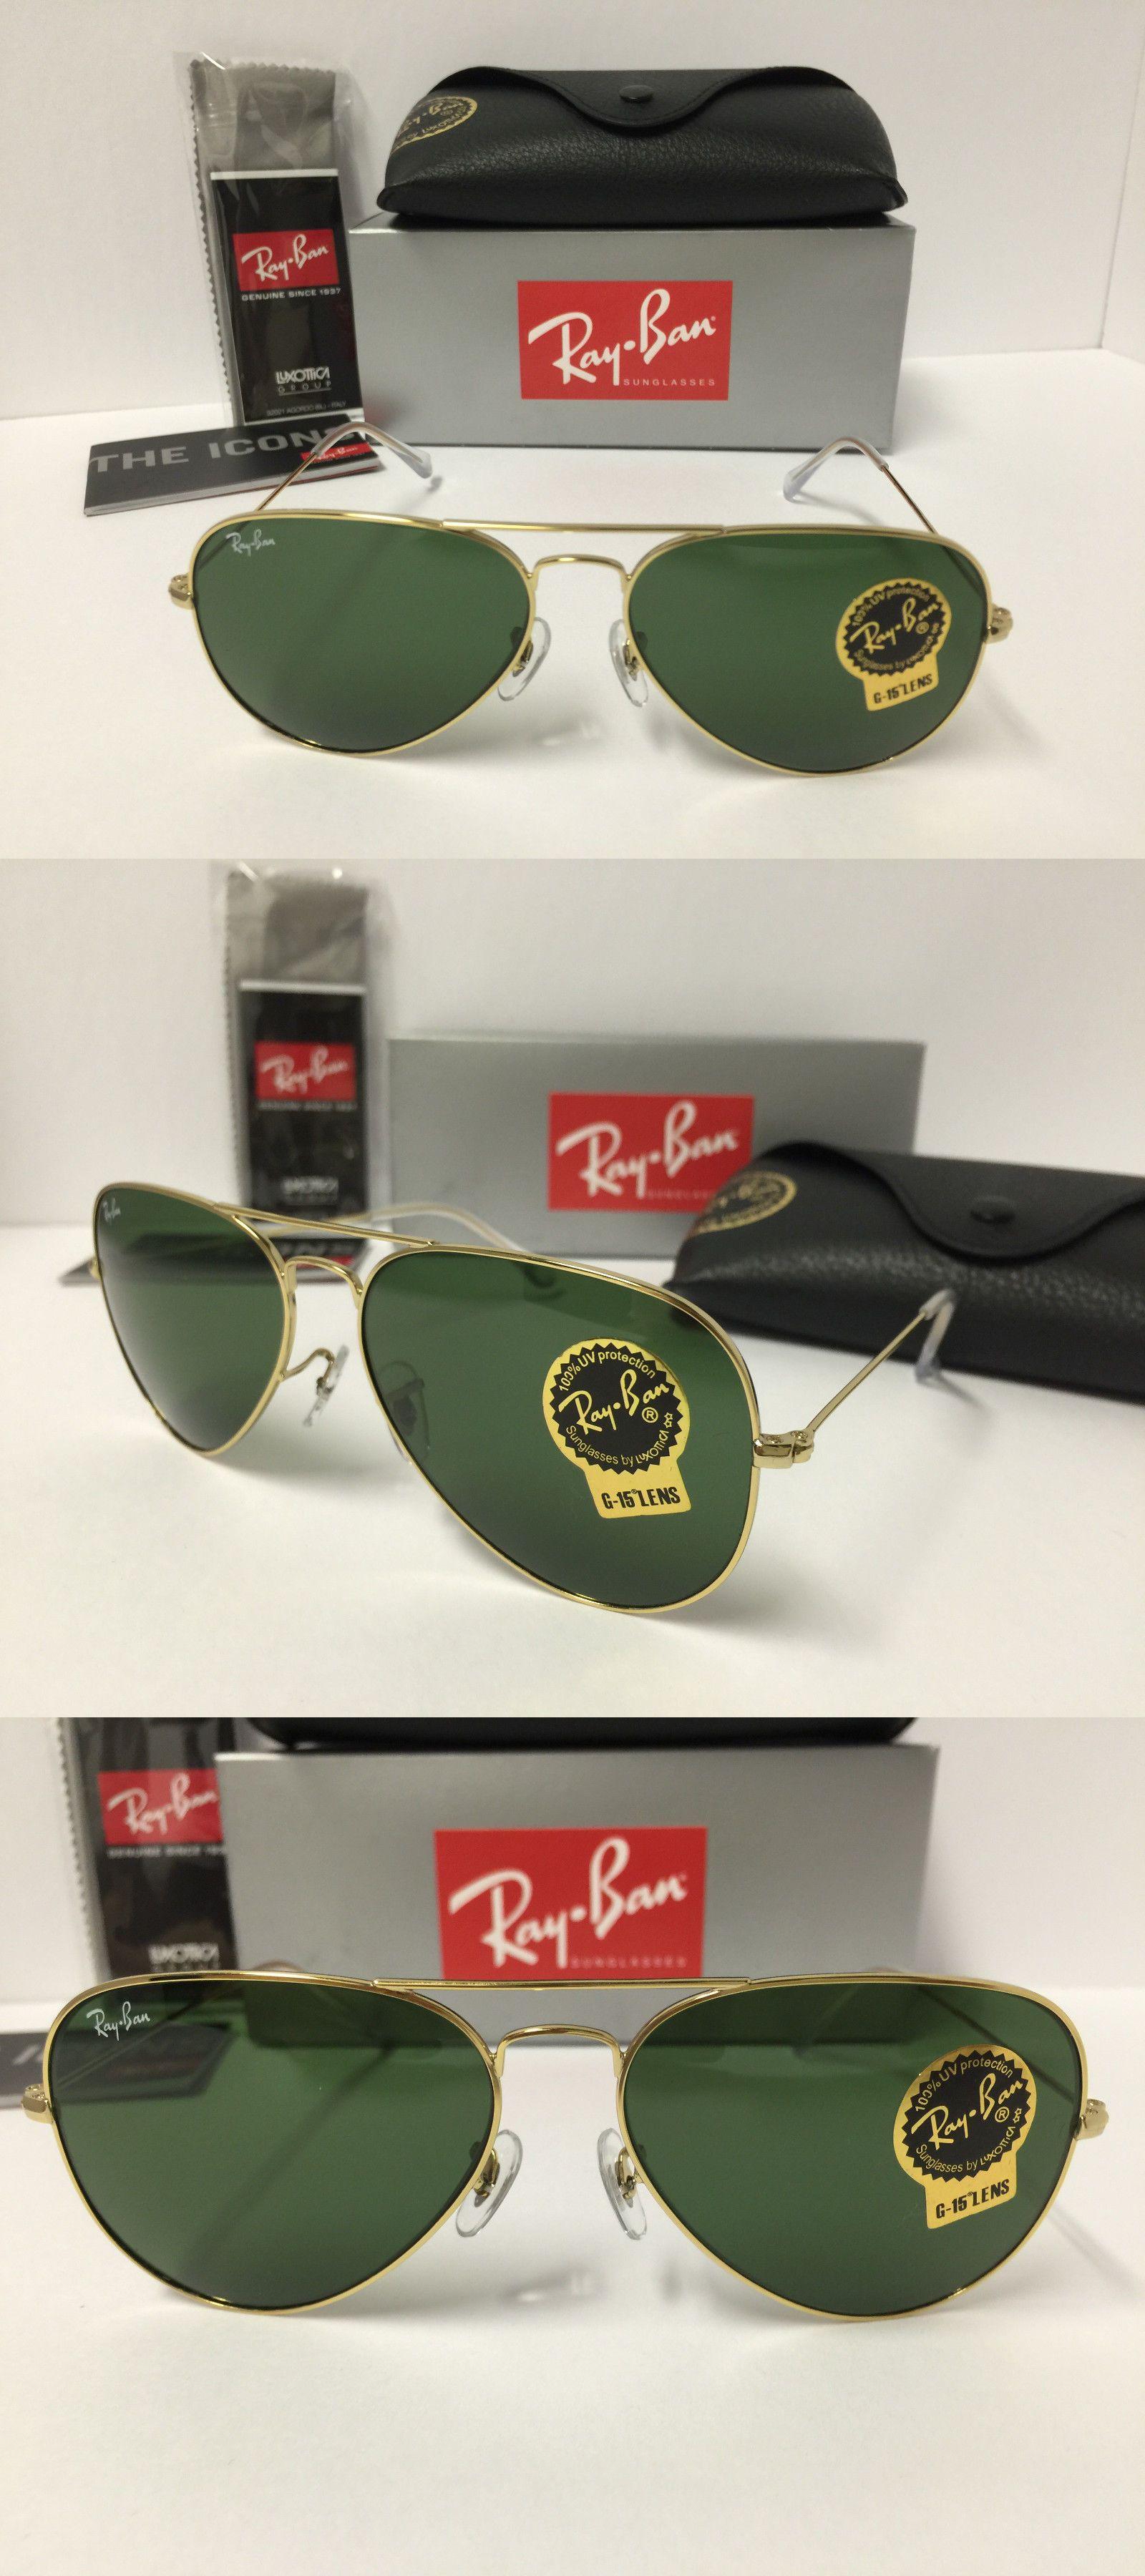 46ebb0234c7 ... hot sunglasses 155189 ray ban aviator sunglasses rb3025 l0205 gold frame  green lenses 58mm a18aa 116cf